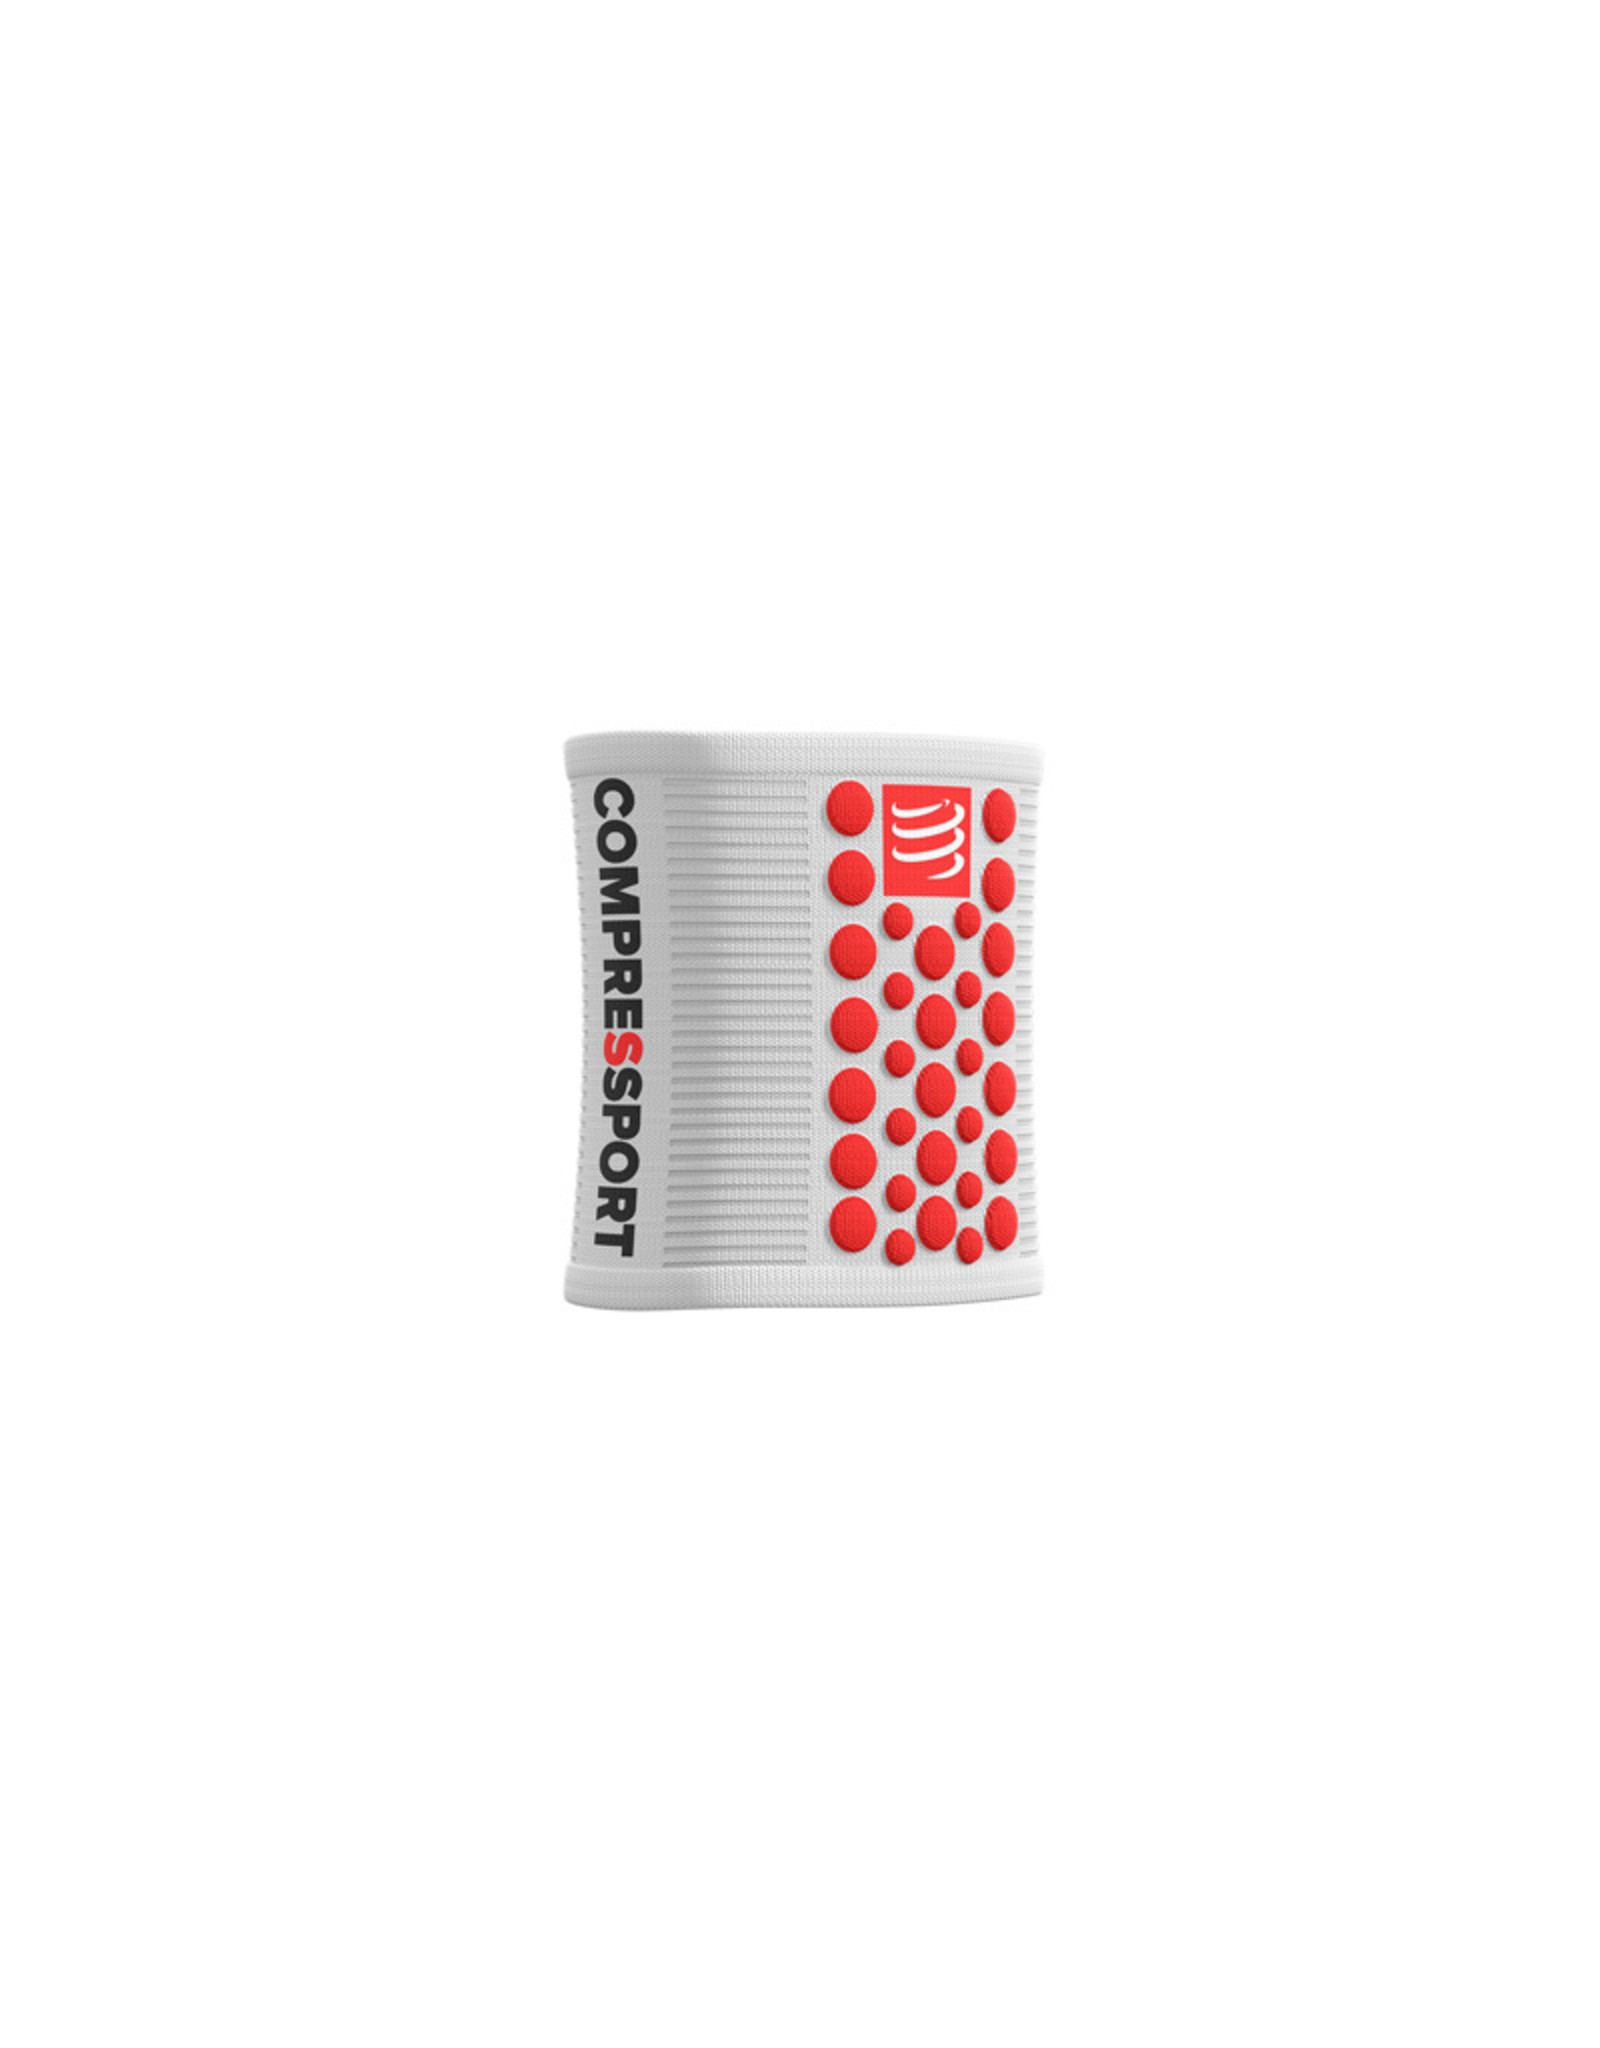 Compressport Zweetbandjes 3D Dots - Wit/Rood